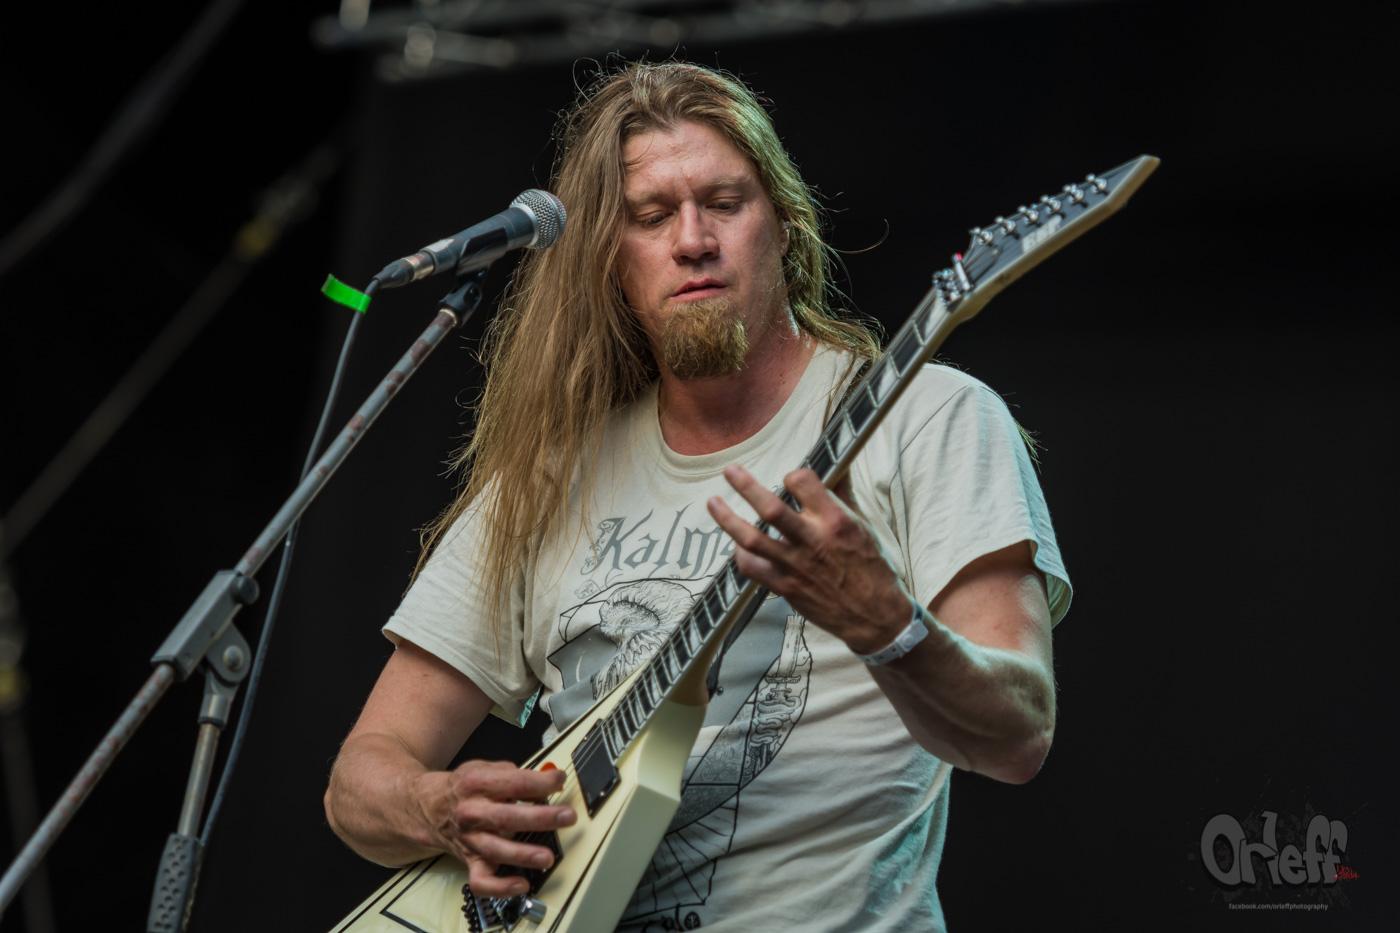 Klamah @ MetalDays Festival 2019